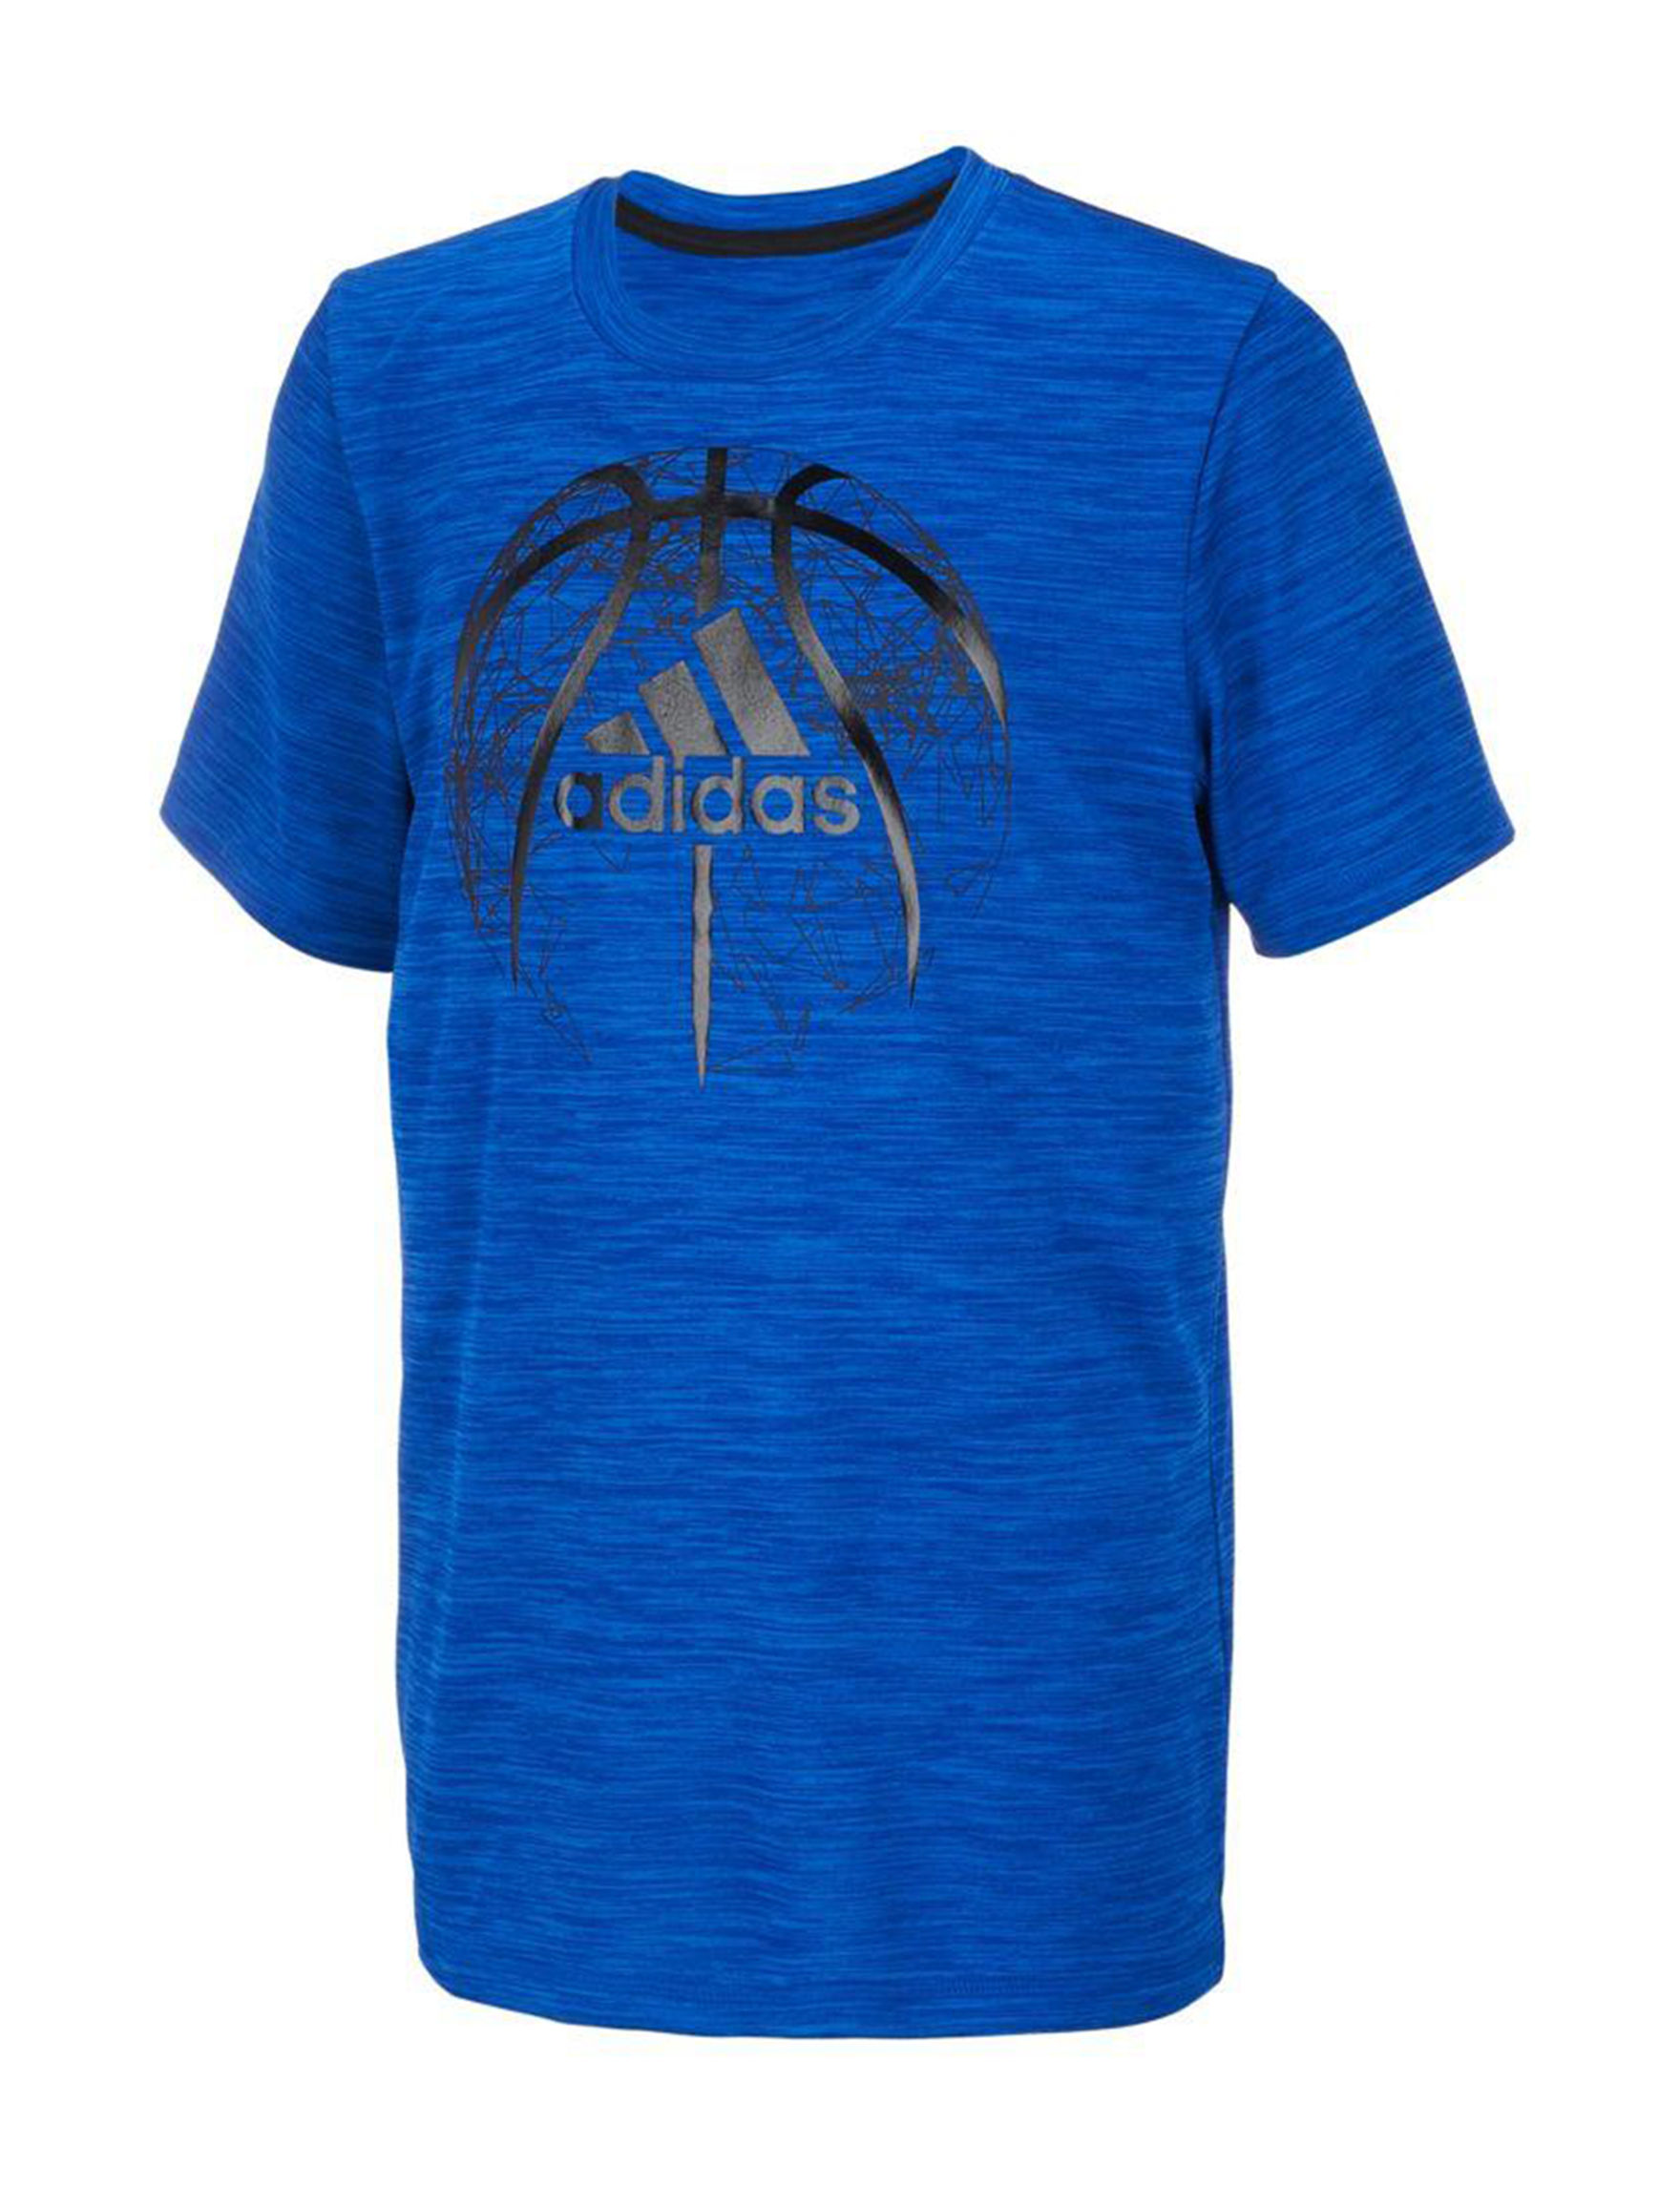 Adidas Royal Blue Tees & Tanks